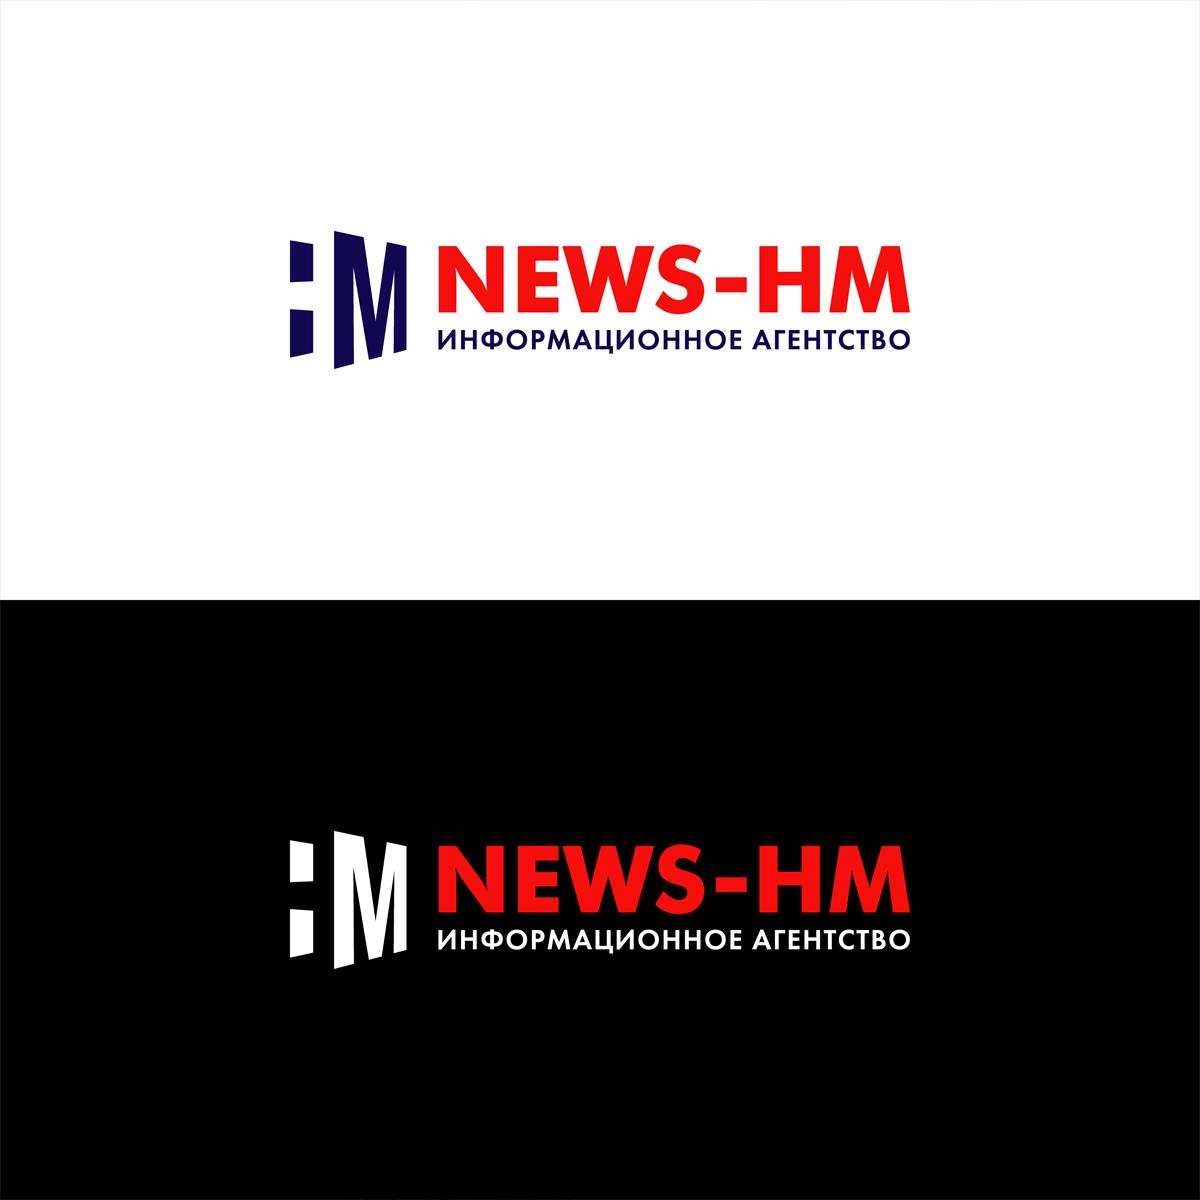 Логотип для информационного агентства фото f_2275aa6595bc23fc.jpg